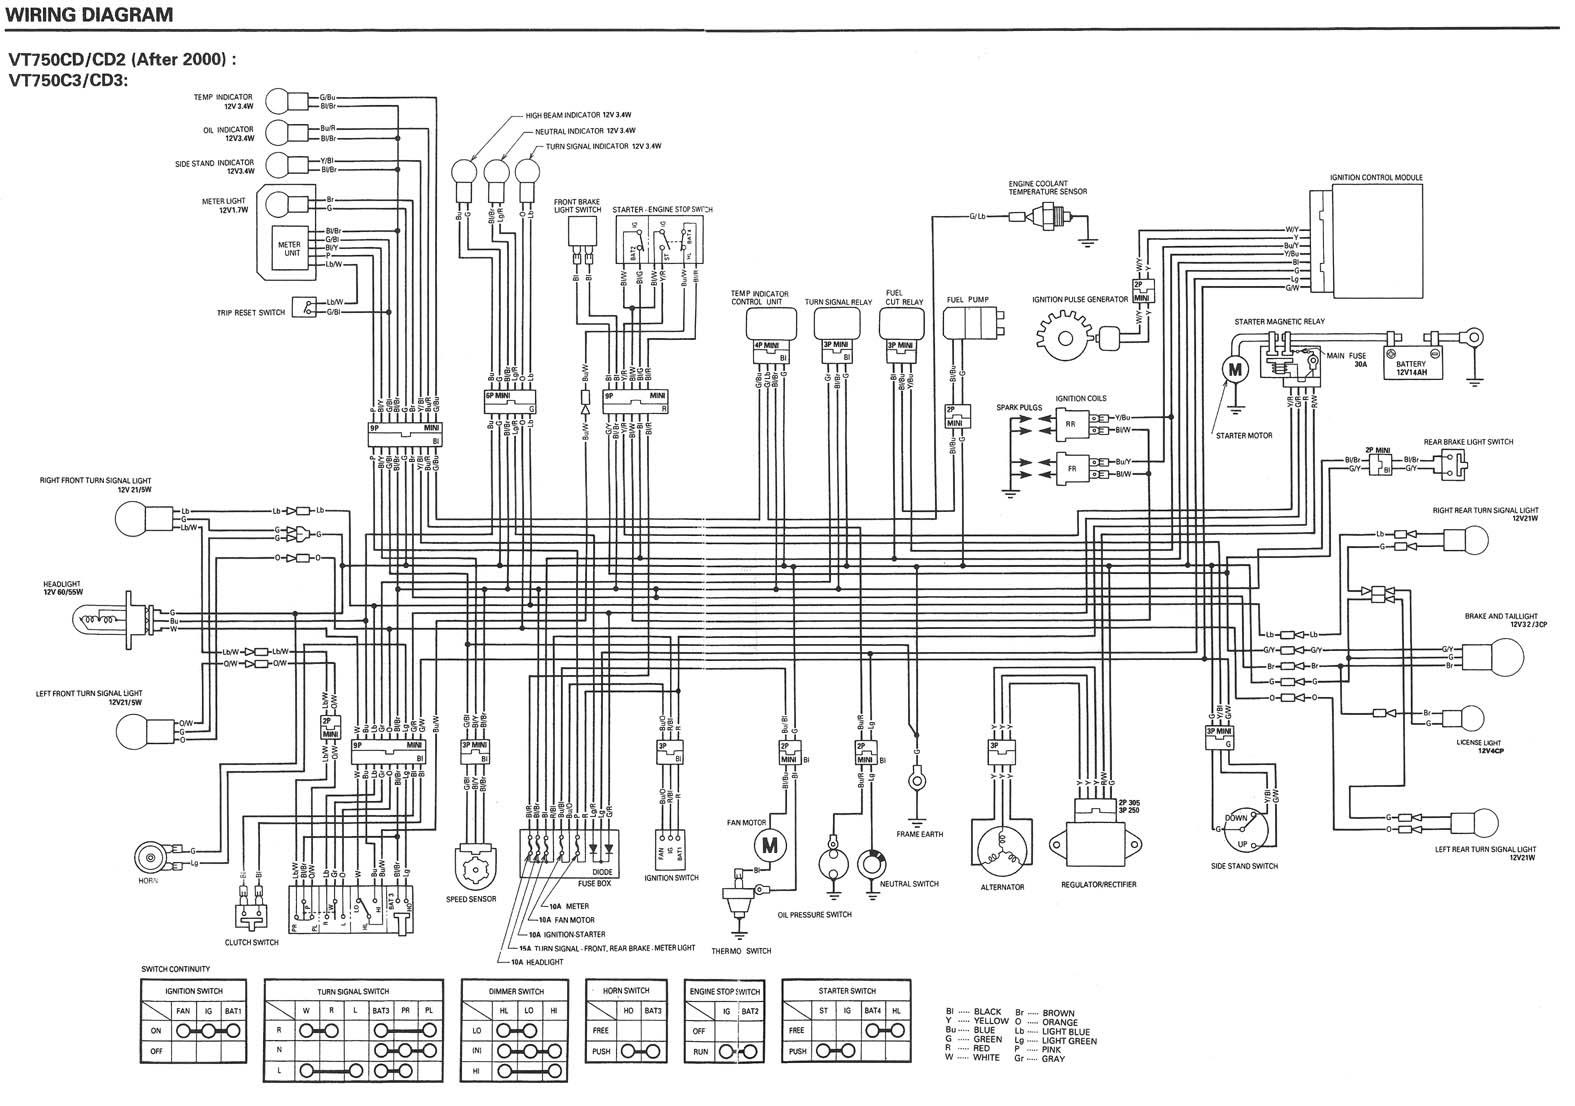 2002 Honda Shadow Sabre Wiring Diagram - Wiring Diagram